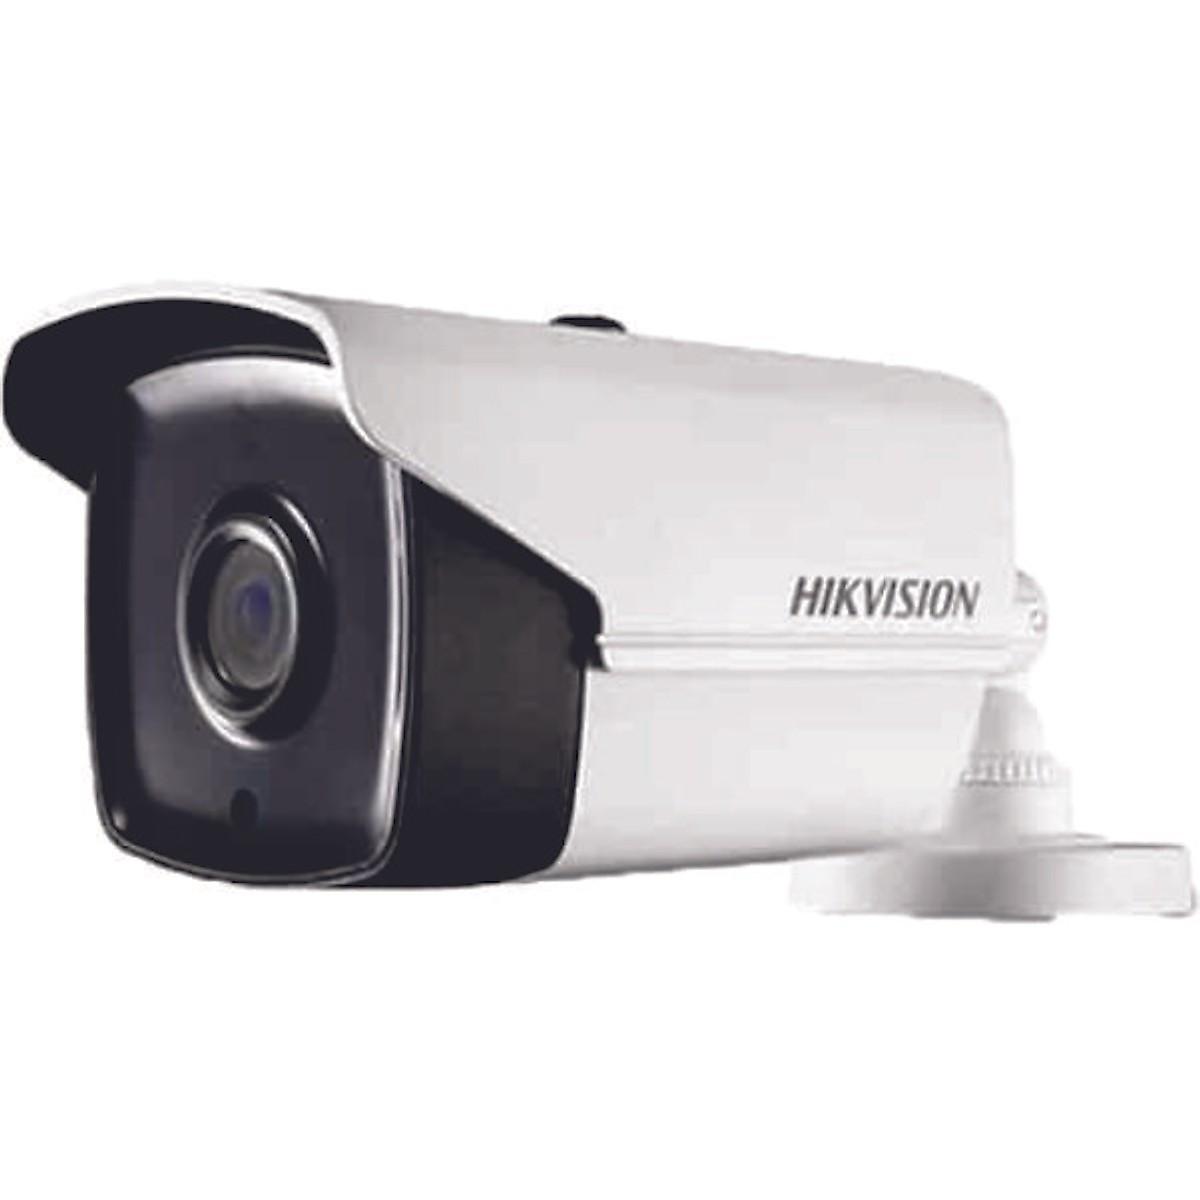 Camera Hikvision DS-2CE16H8T-ITF Chính hãng